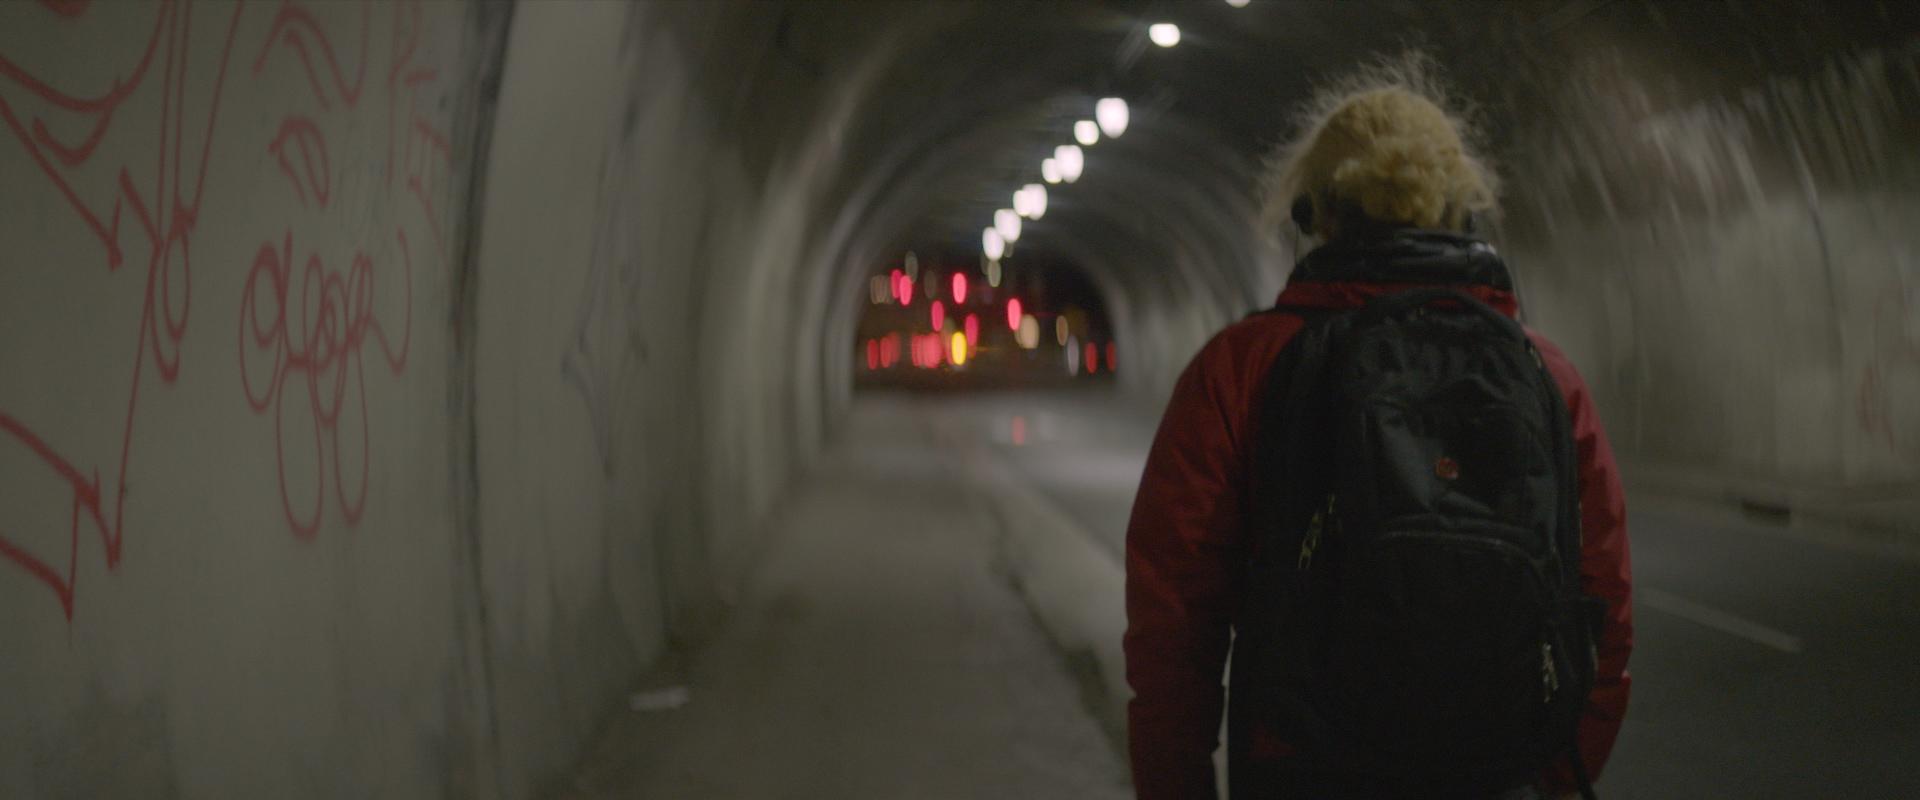 Tunnel - Still Preview.jpg